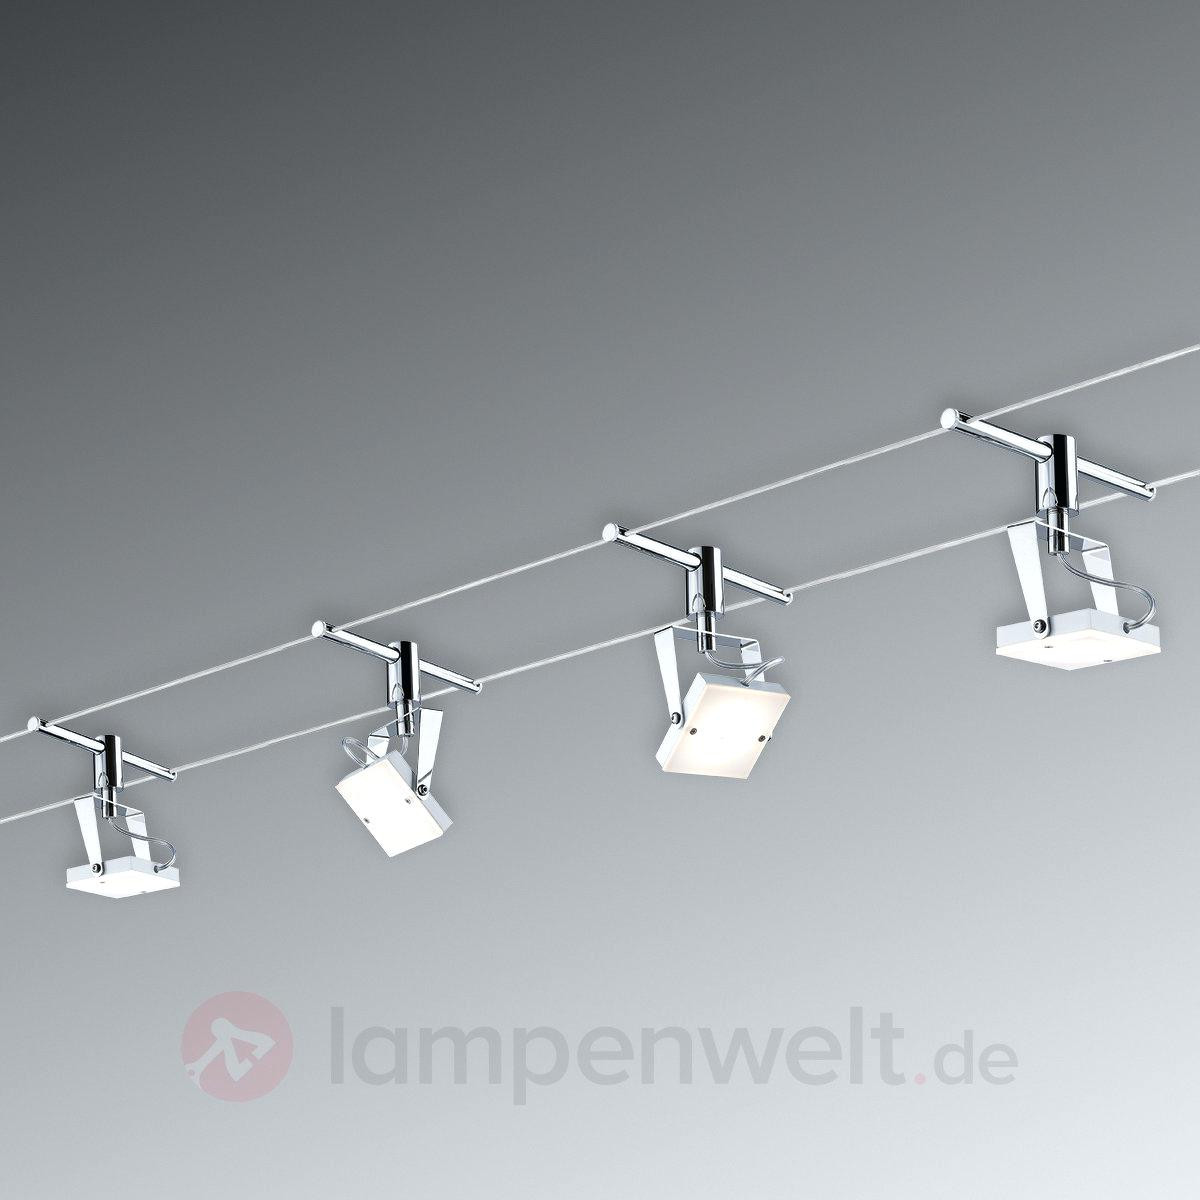 Seilsysteme Beleuchtung  Beleuchtung Seilsystem Led Komplettset Basis Mit